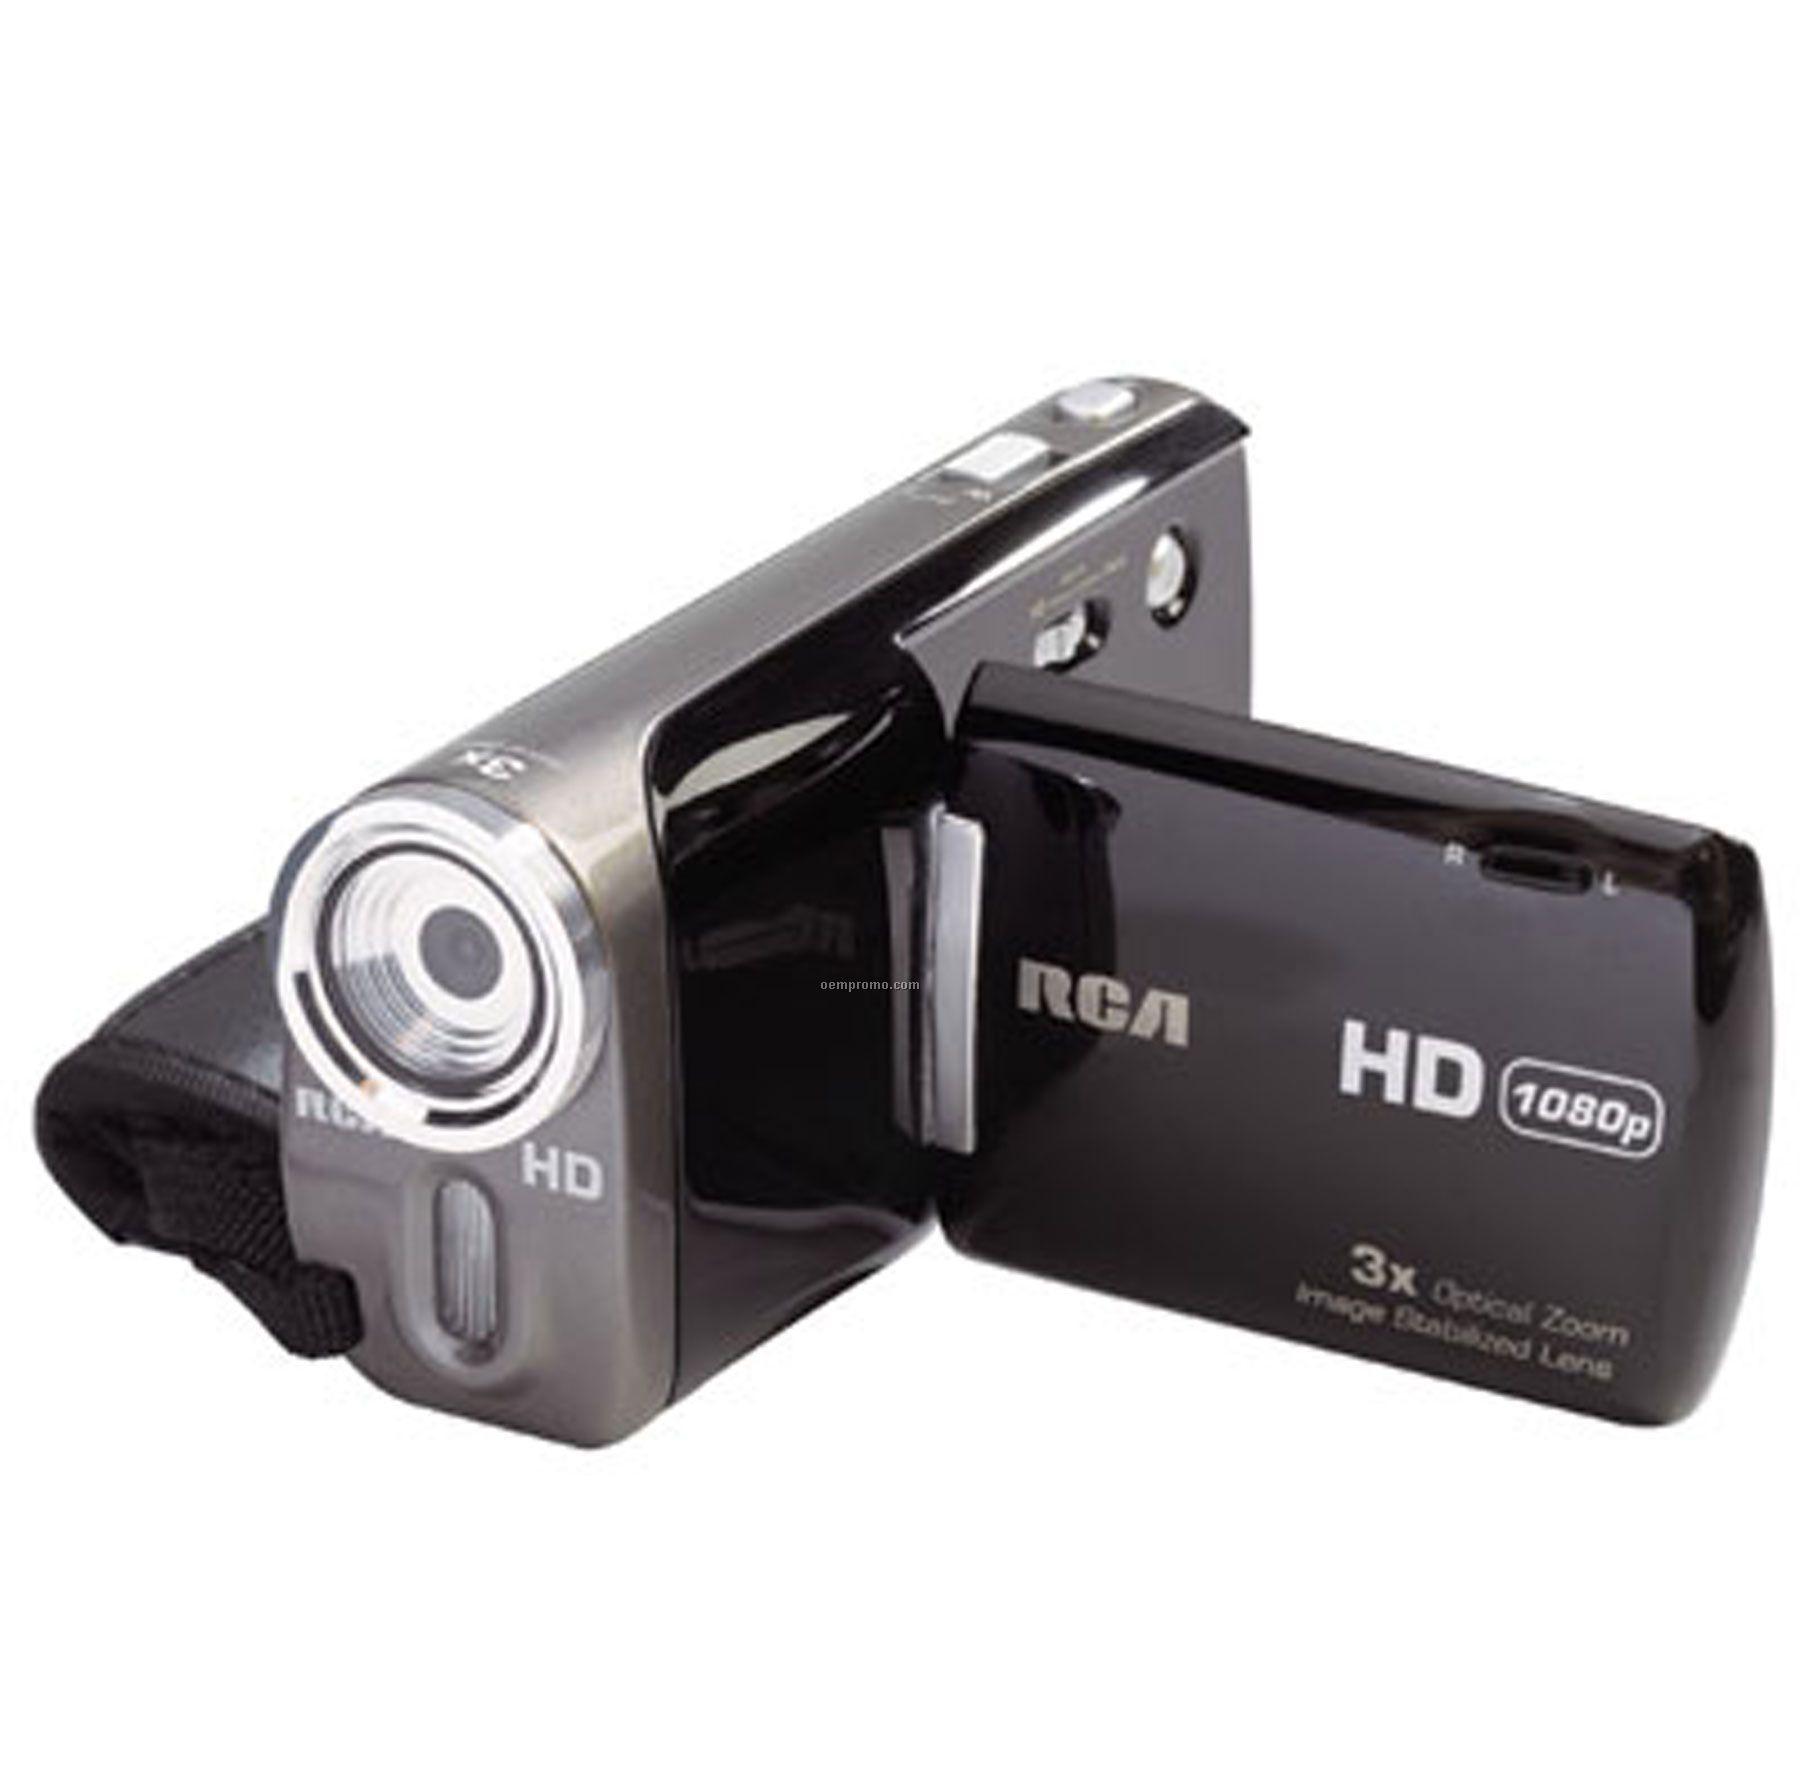 Rca Ez5100 Palm 1080p 5x Optical Zoom Camcorder